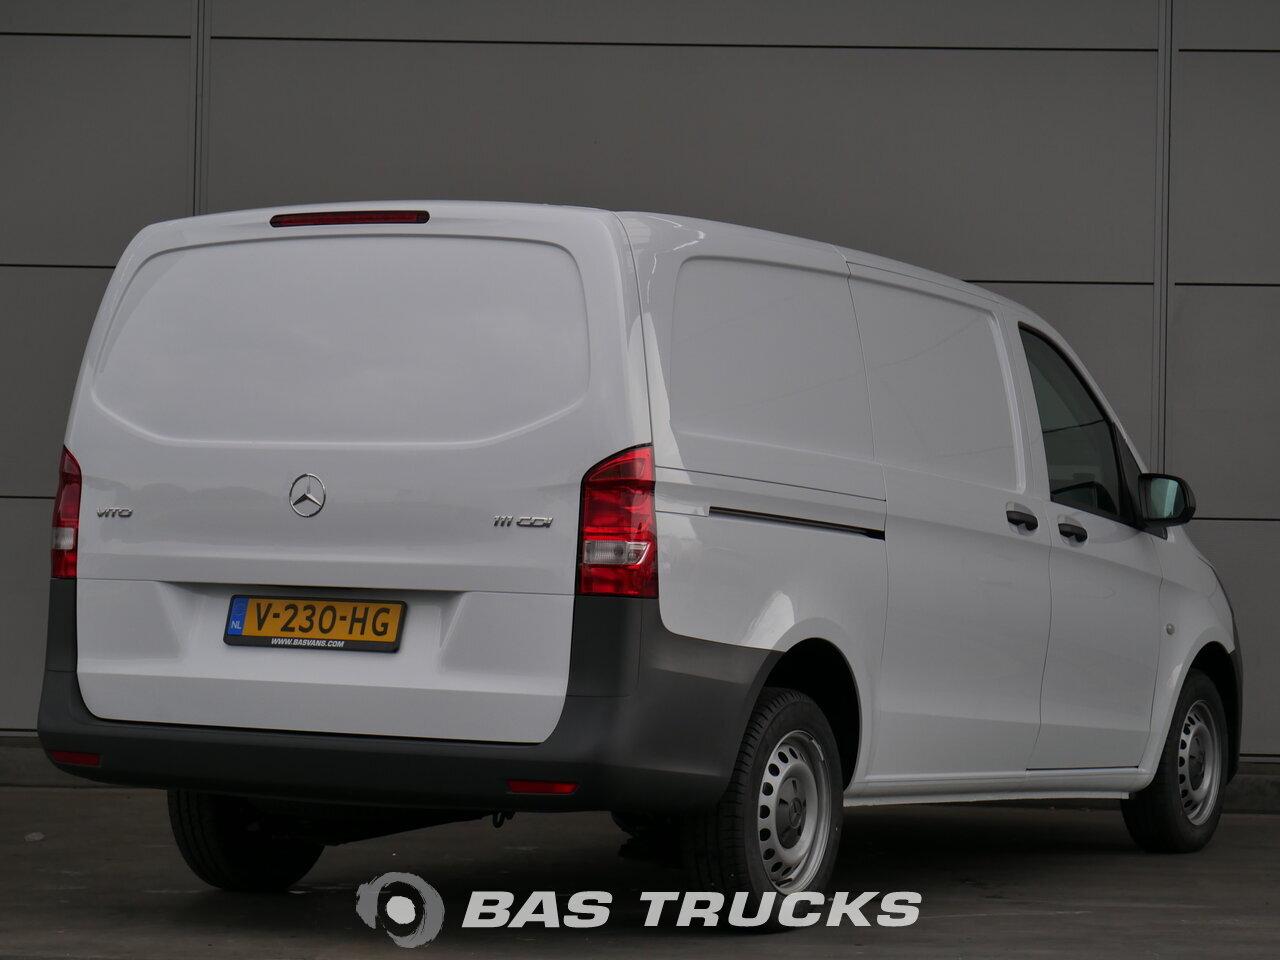 mercedes vito leichte nutzfahrzeuge 17400 bas vans. Black Bedroom Furniture Sets. Home Design Ideas